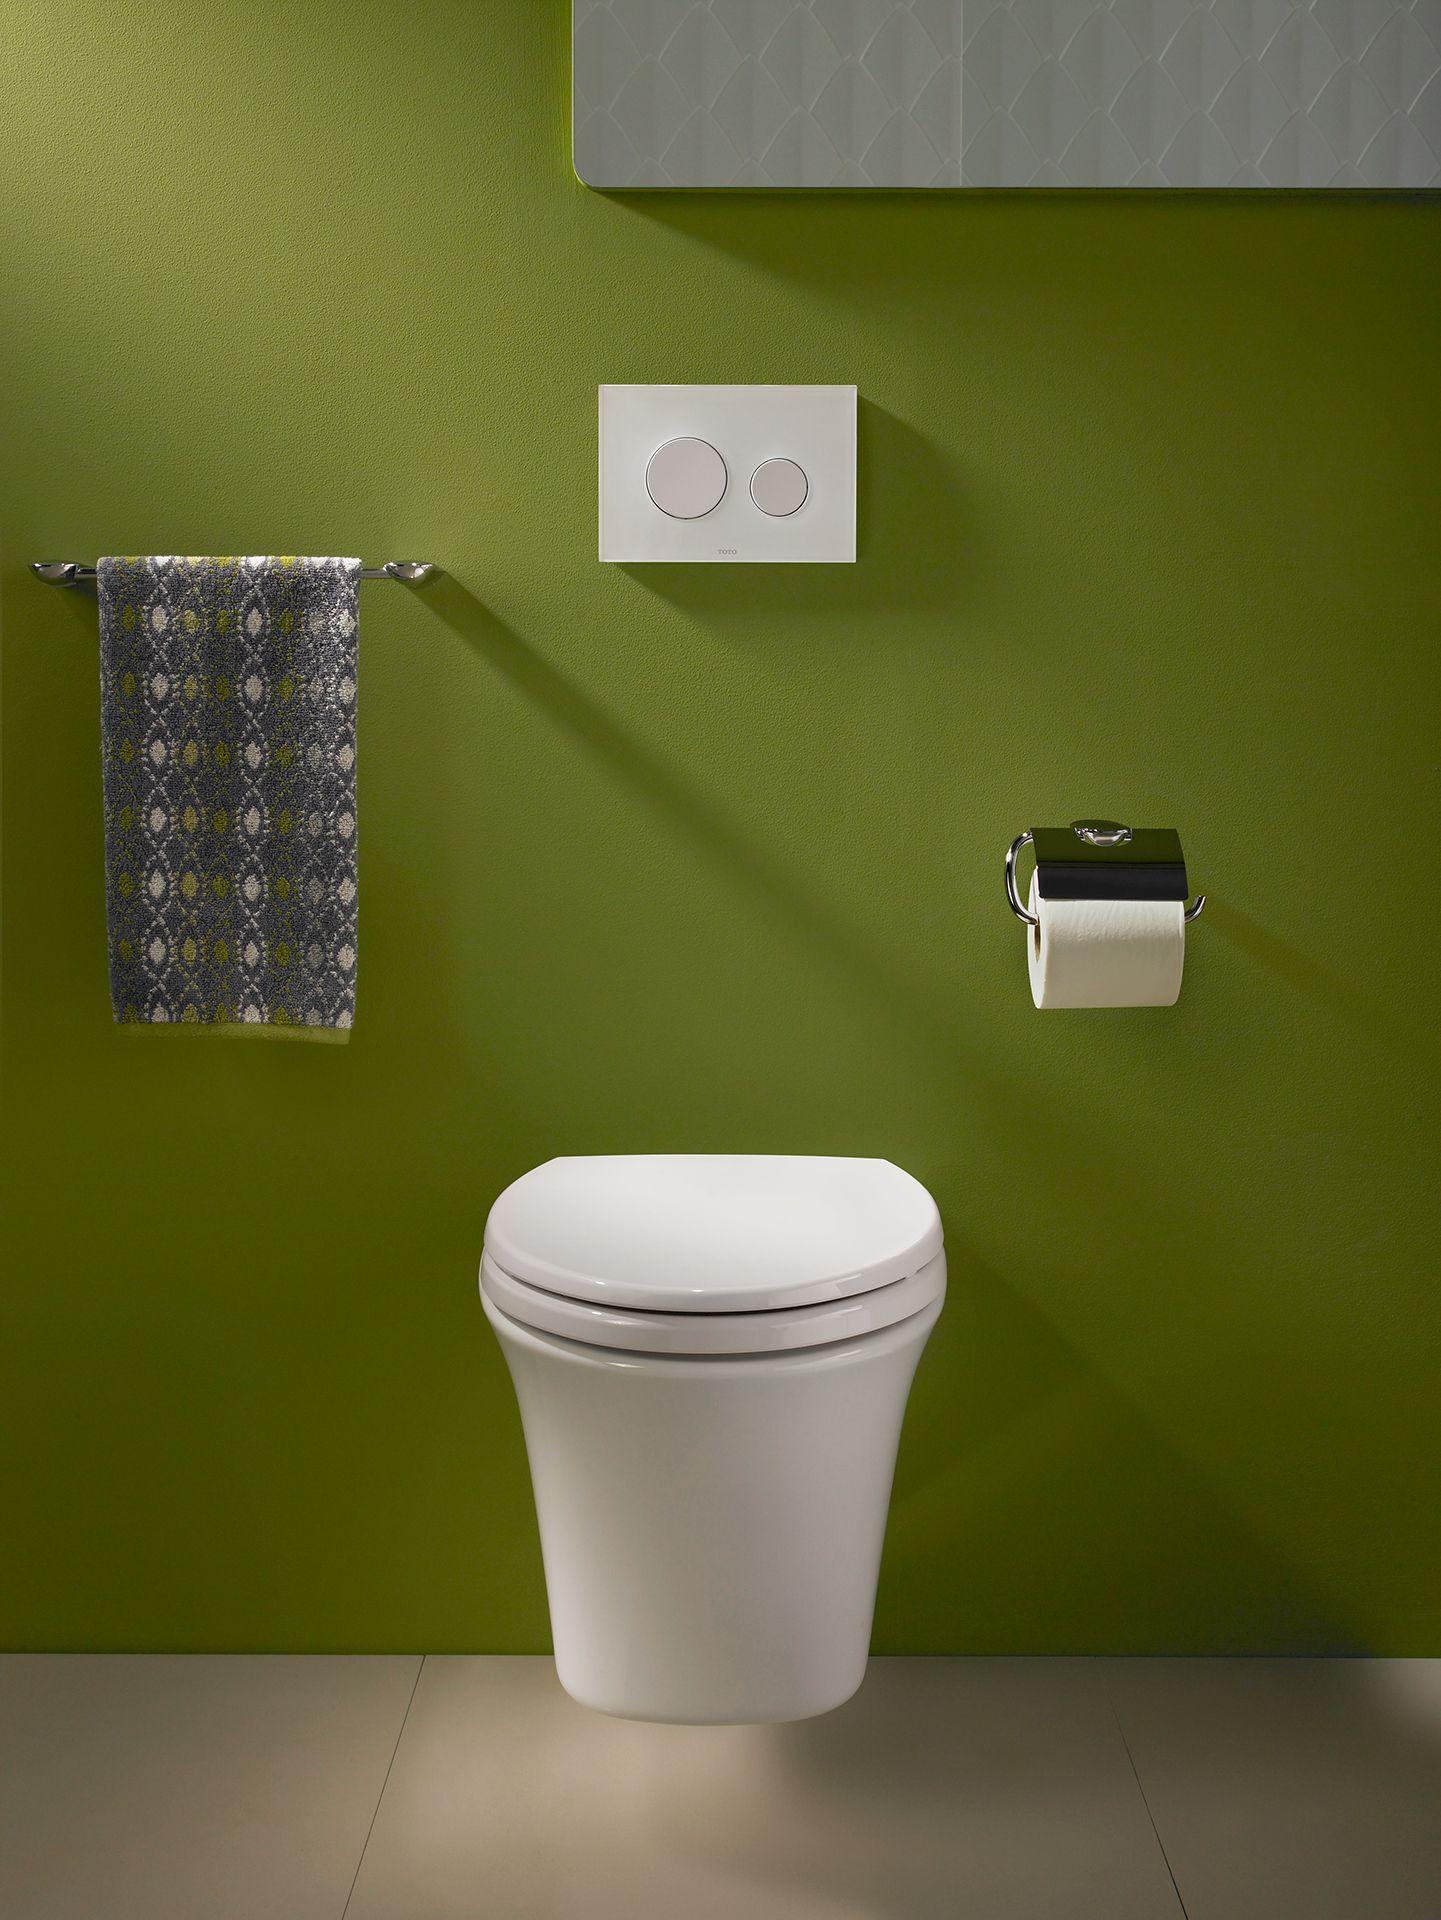 All about Totousacom Aquia Wallhung Dualflush Toilet 16 Gpf ...